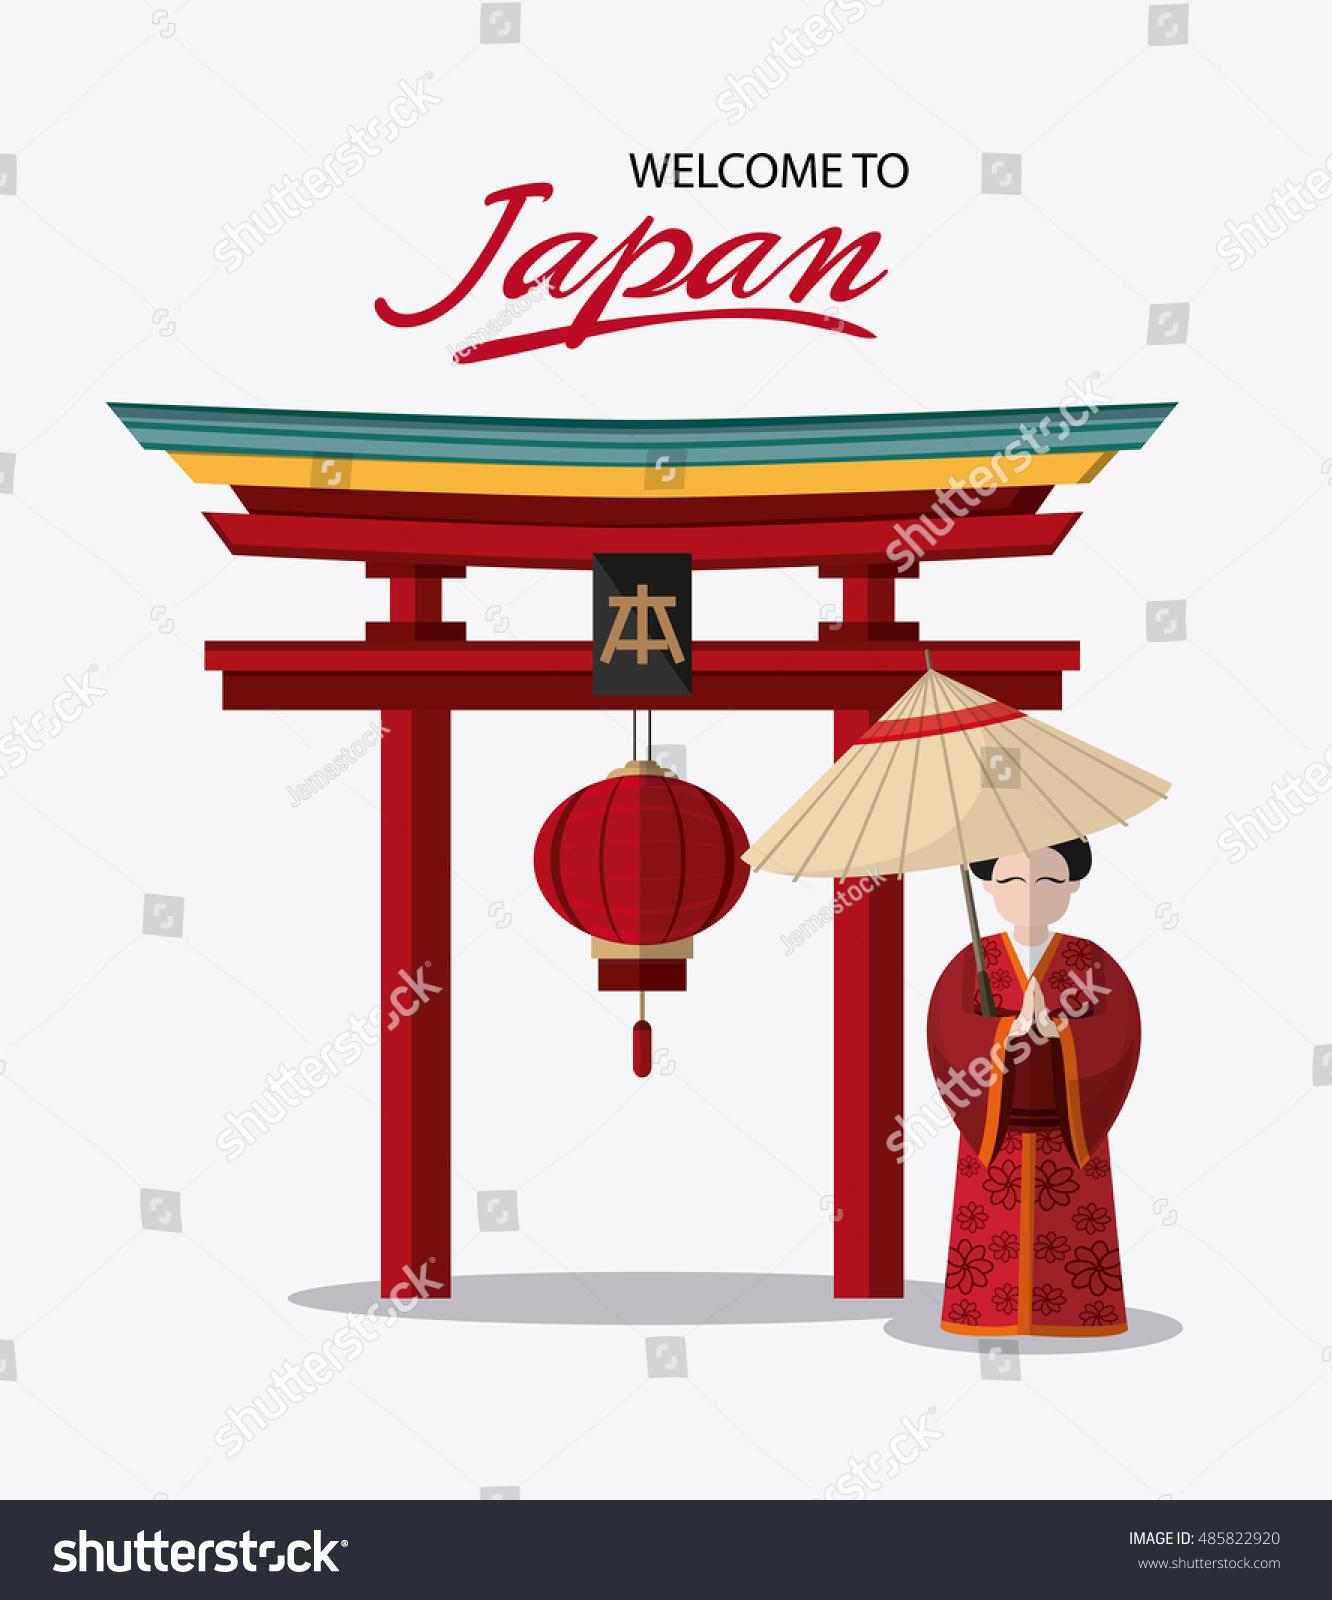 Japan culture landmark design stock vector 485822920 for Landmark design